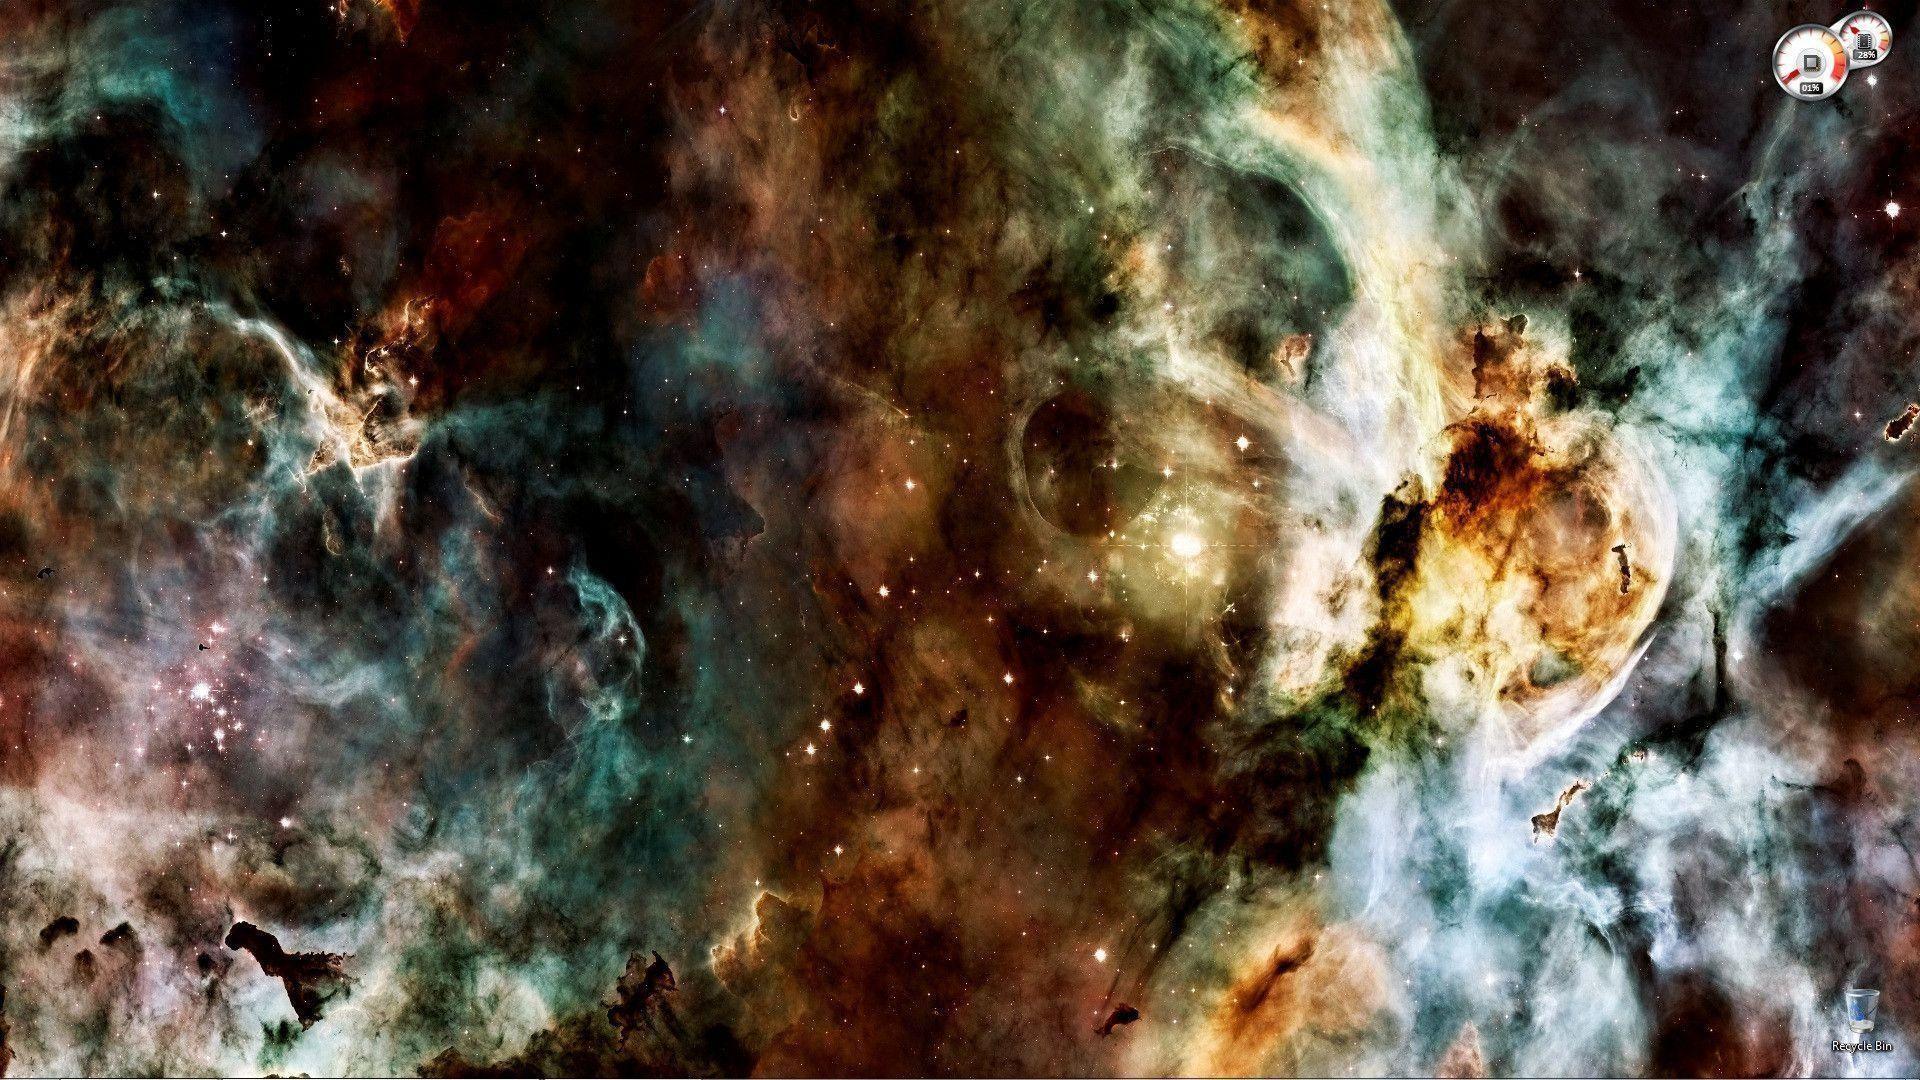 Hubble Telescope Wallpaper – Viewing Gallery